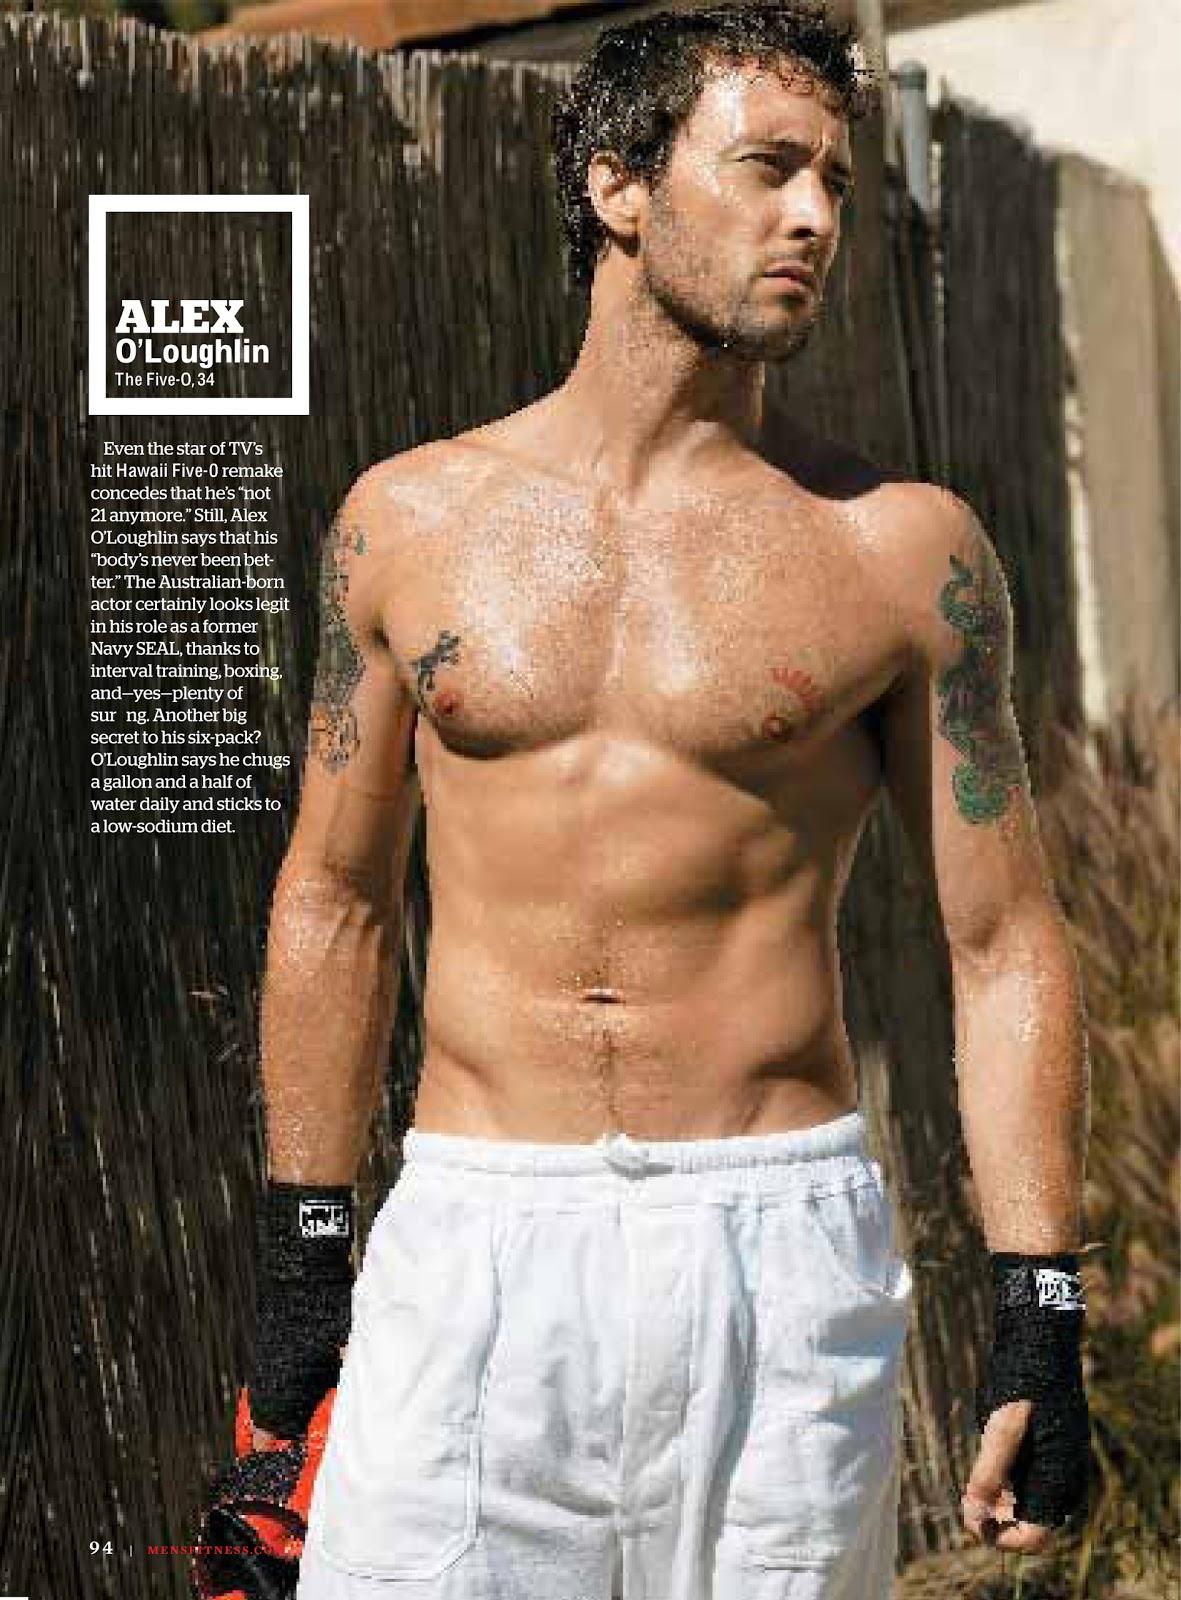 Hawaii Five-0 News Alex Oloughlin Among Mens Fitness -4953